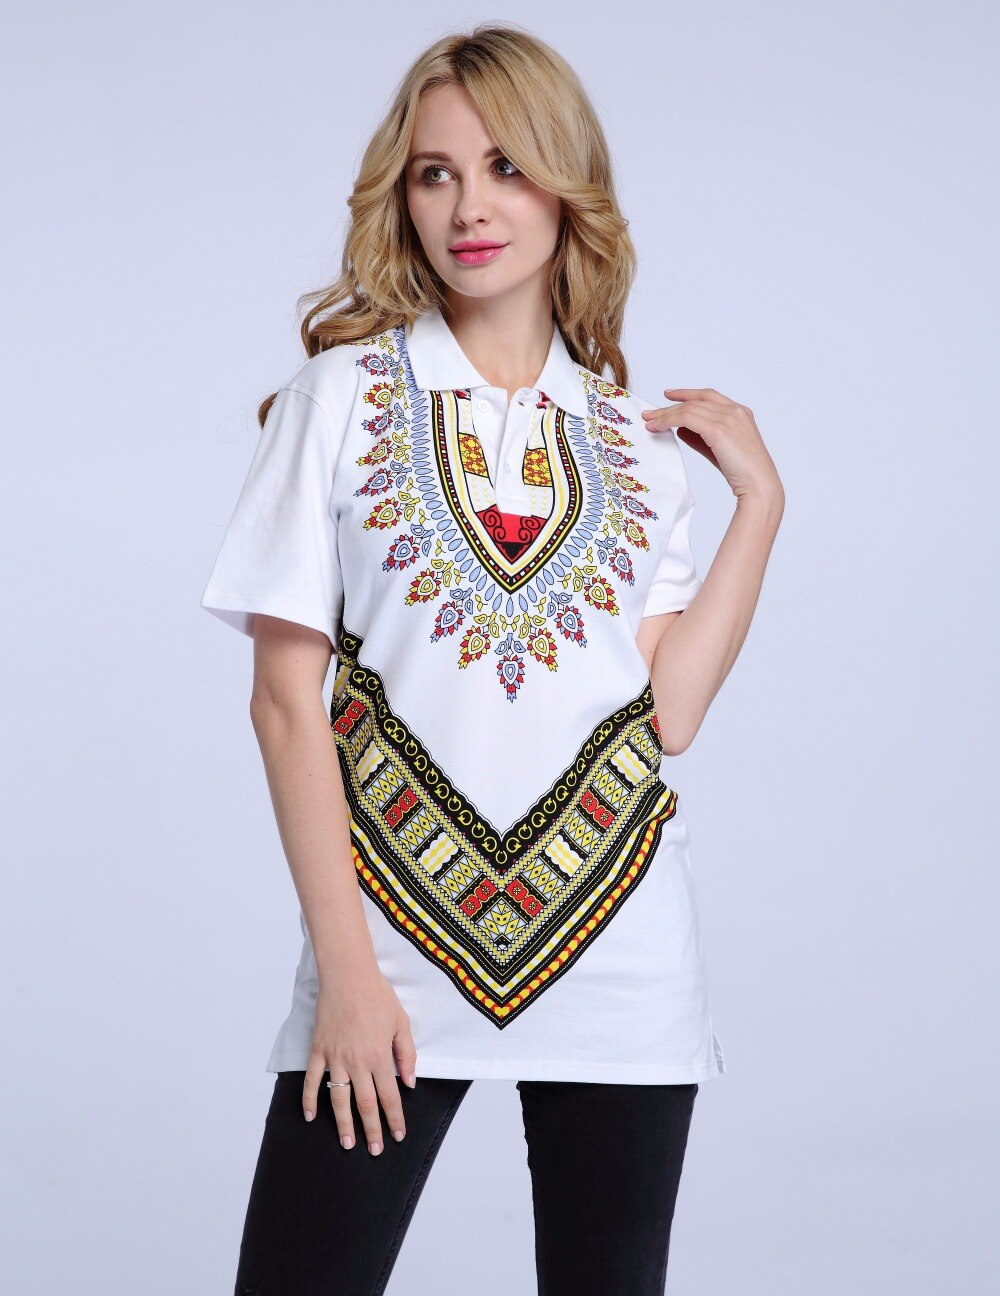 Dashikiage New Design African Print Dashiki Shirts Fashion T-shirt - Unisex